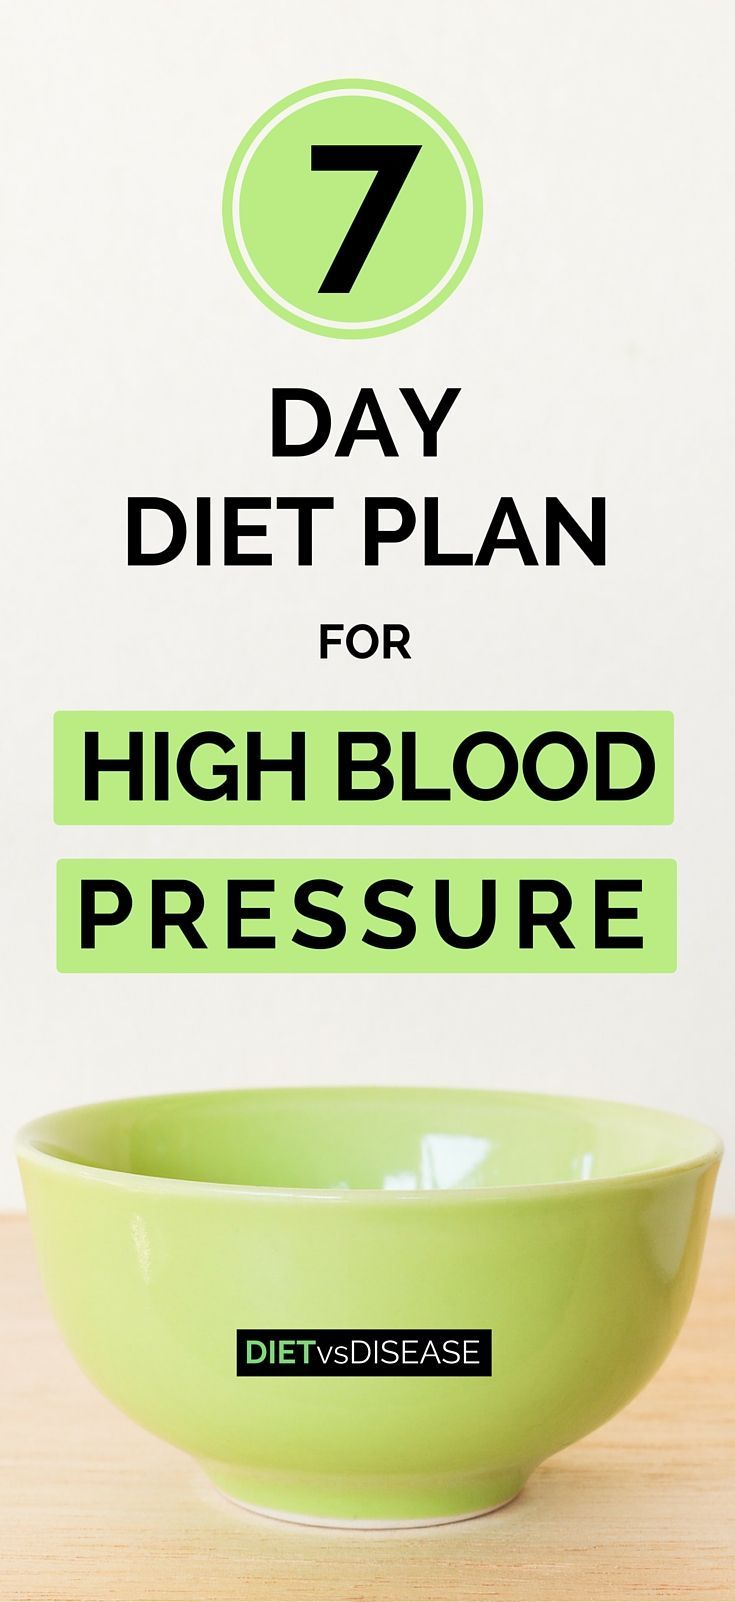 Diet plan for beginner triathlete